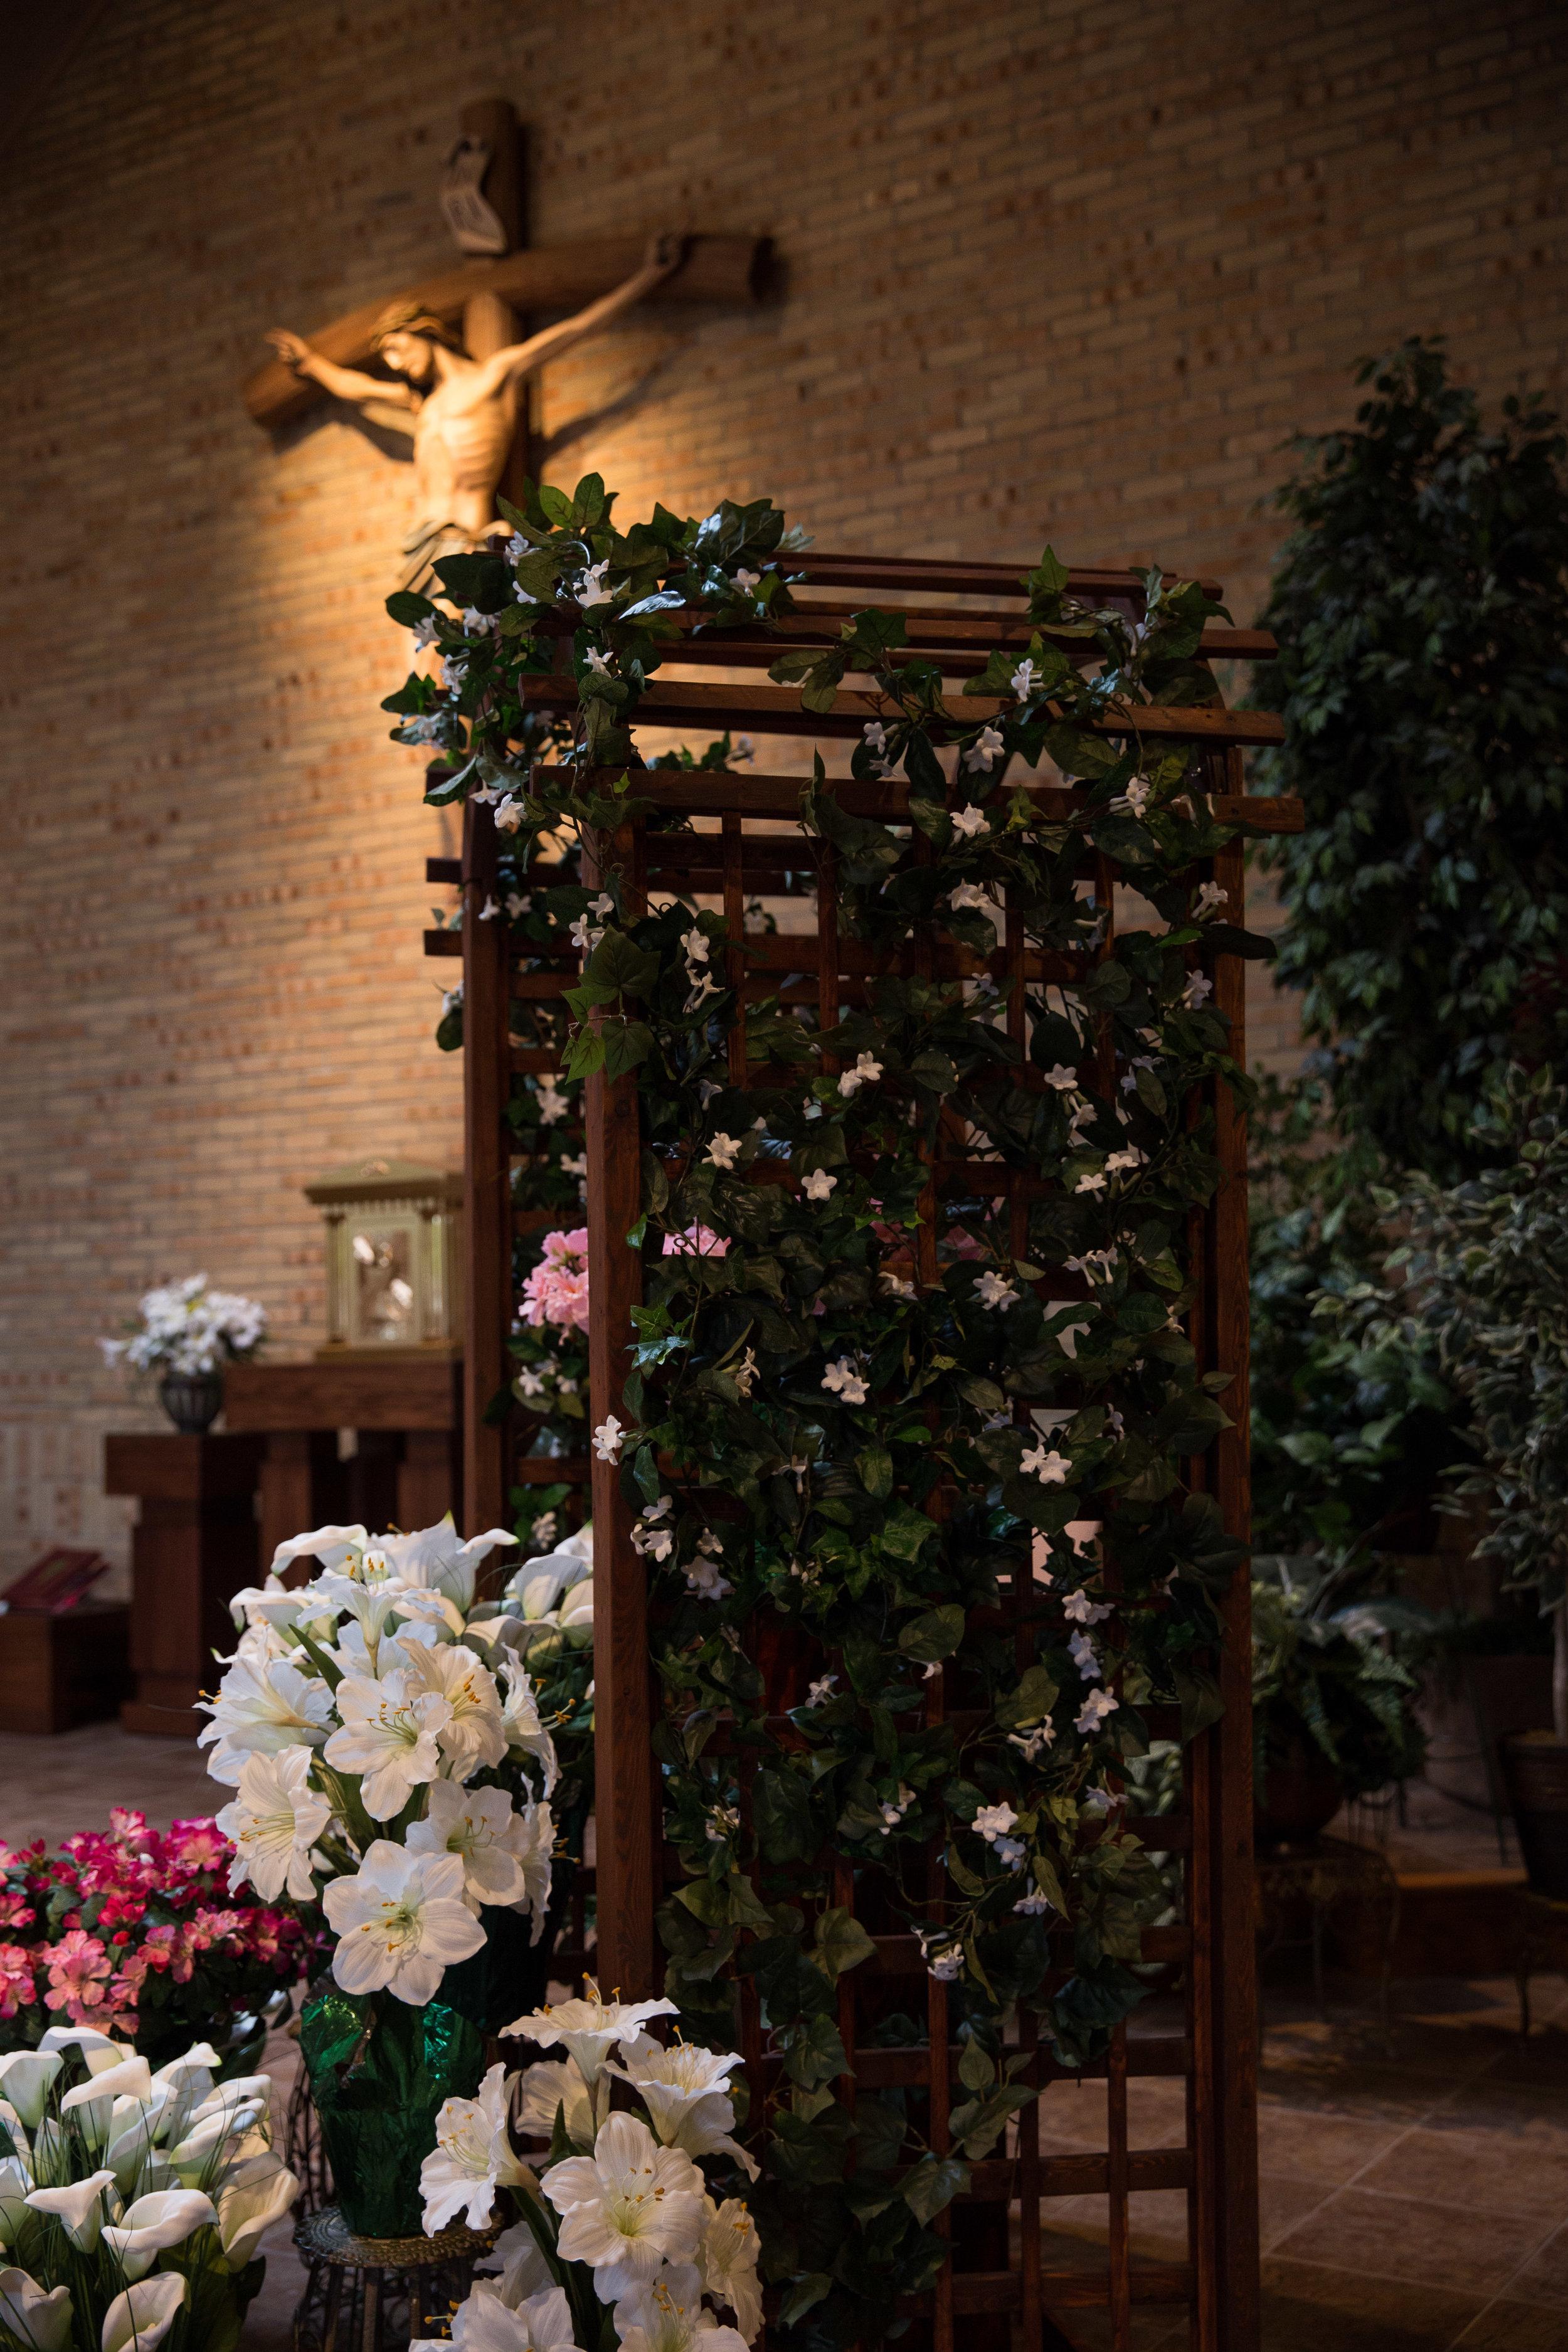 Natalie and Dallas Mooney Wedding 6-8-19_Tania Watt Photography-51.jpg